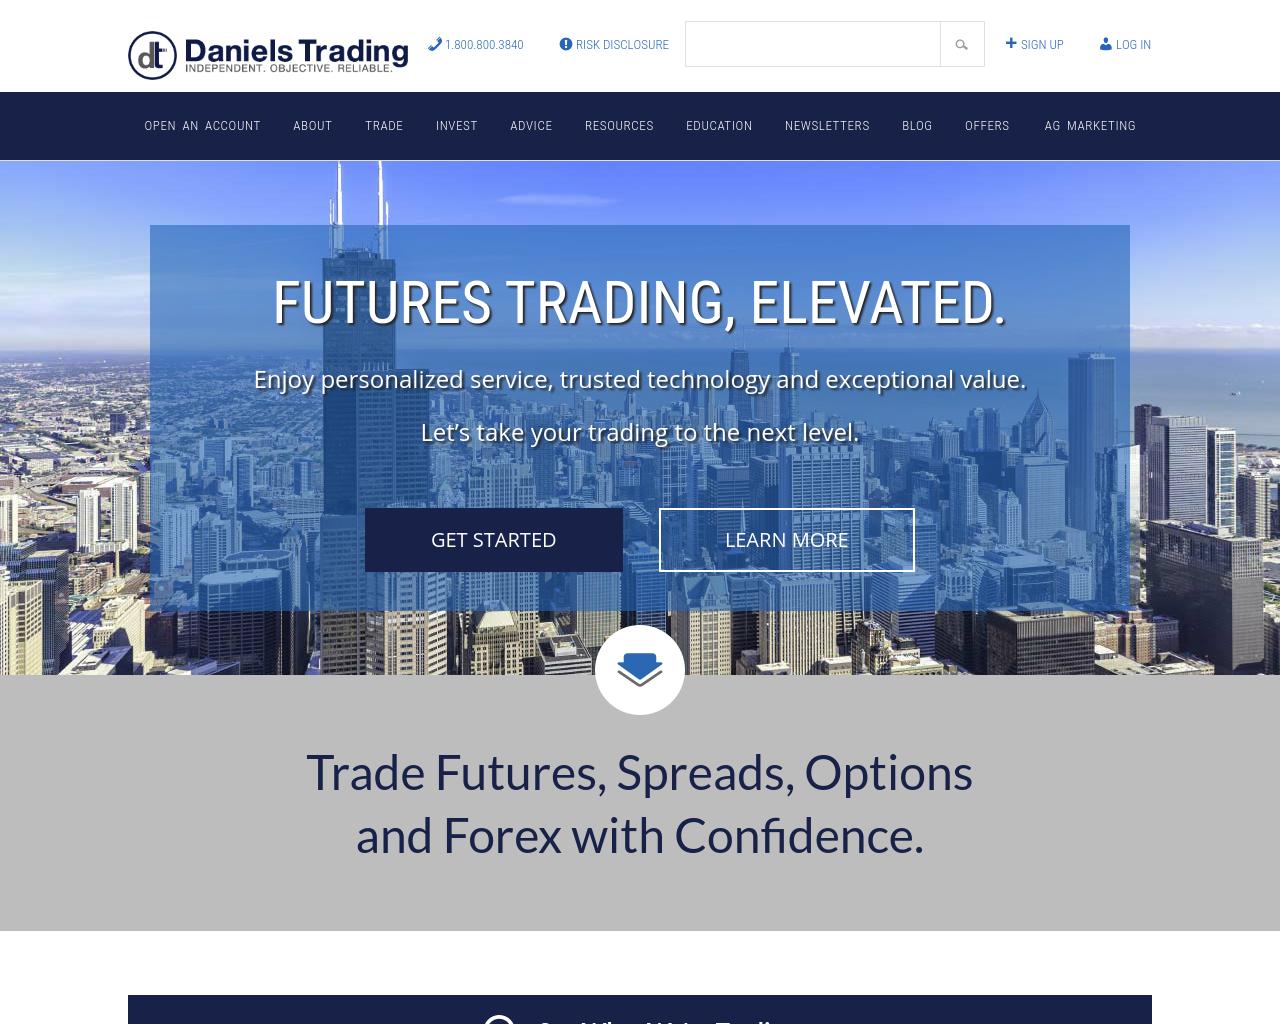 Daniels-Trading-Advertising-Reviews-Pricing